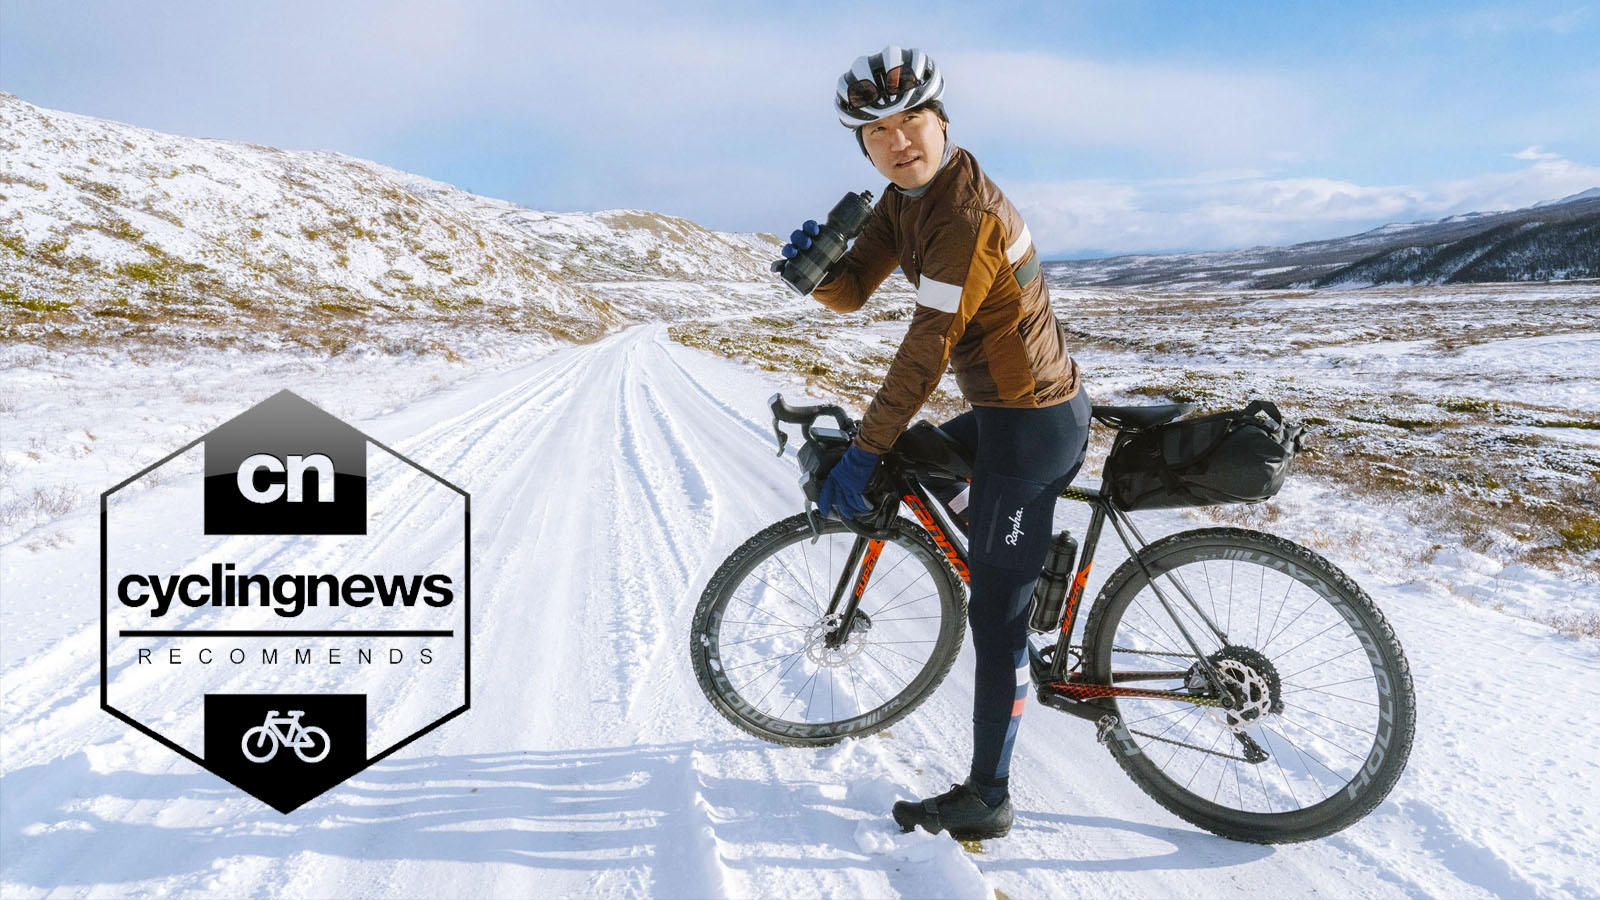 MY KILOMETRE Gravel Men Thermal Bib Tights Winter Cycling Bib Pants with Side Pockets